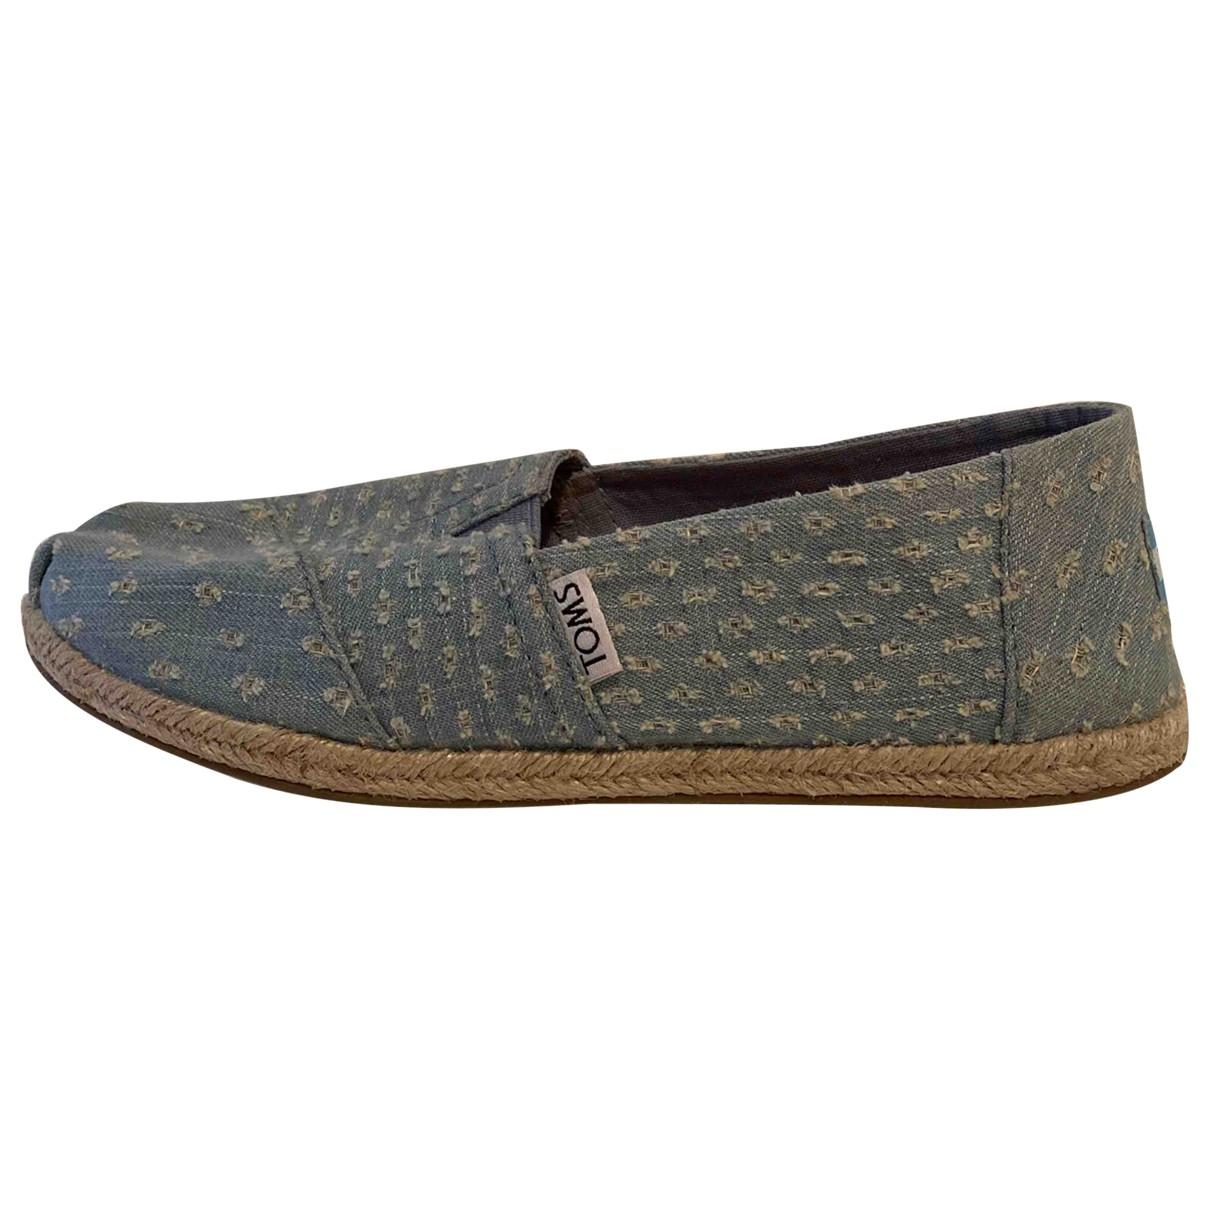 Toms \N Espadrilles in  Tuerkis Denim - Jeans